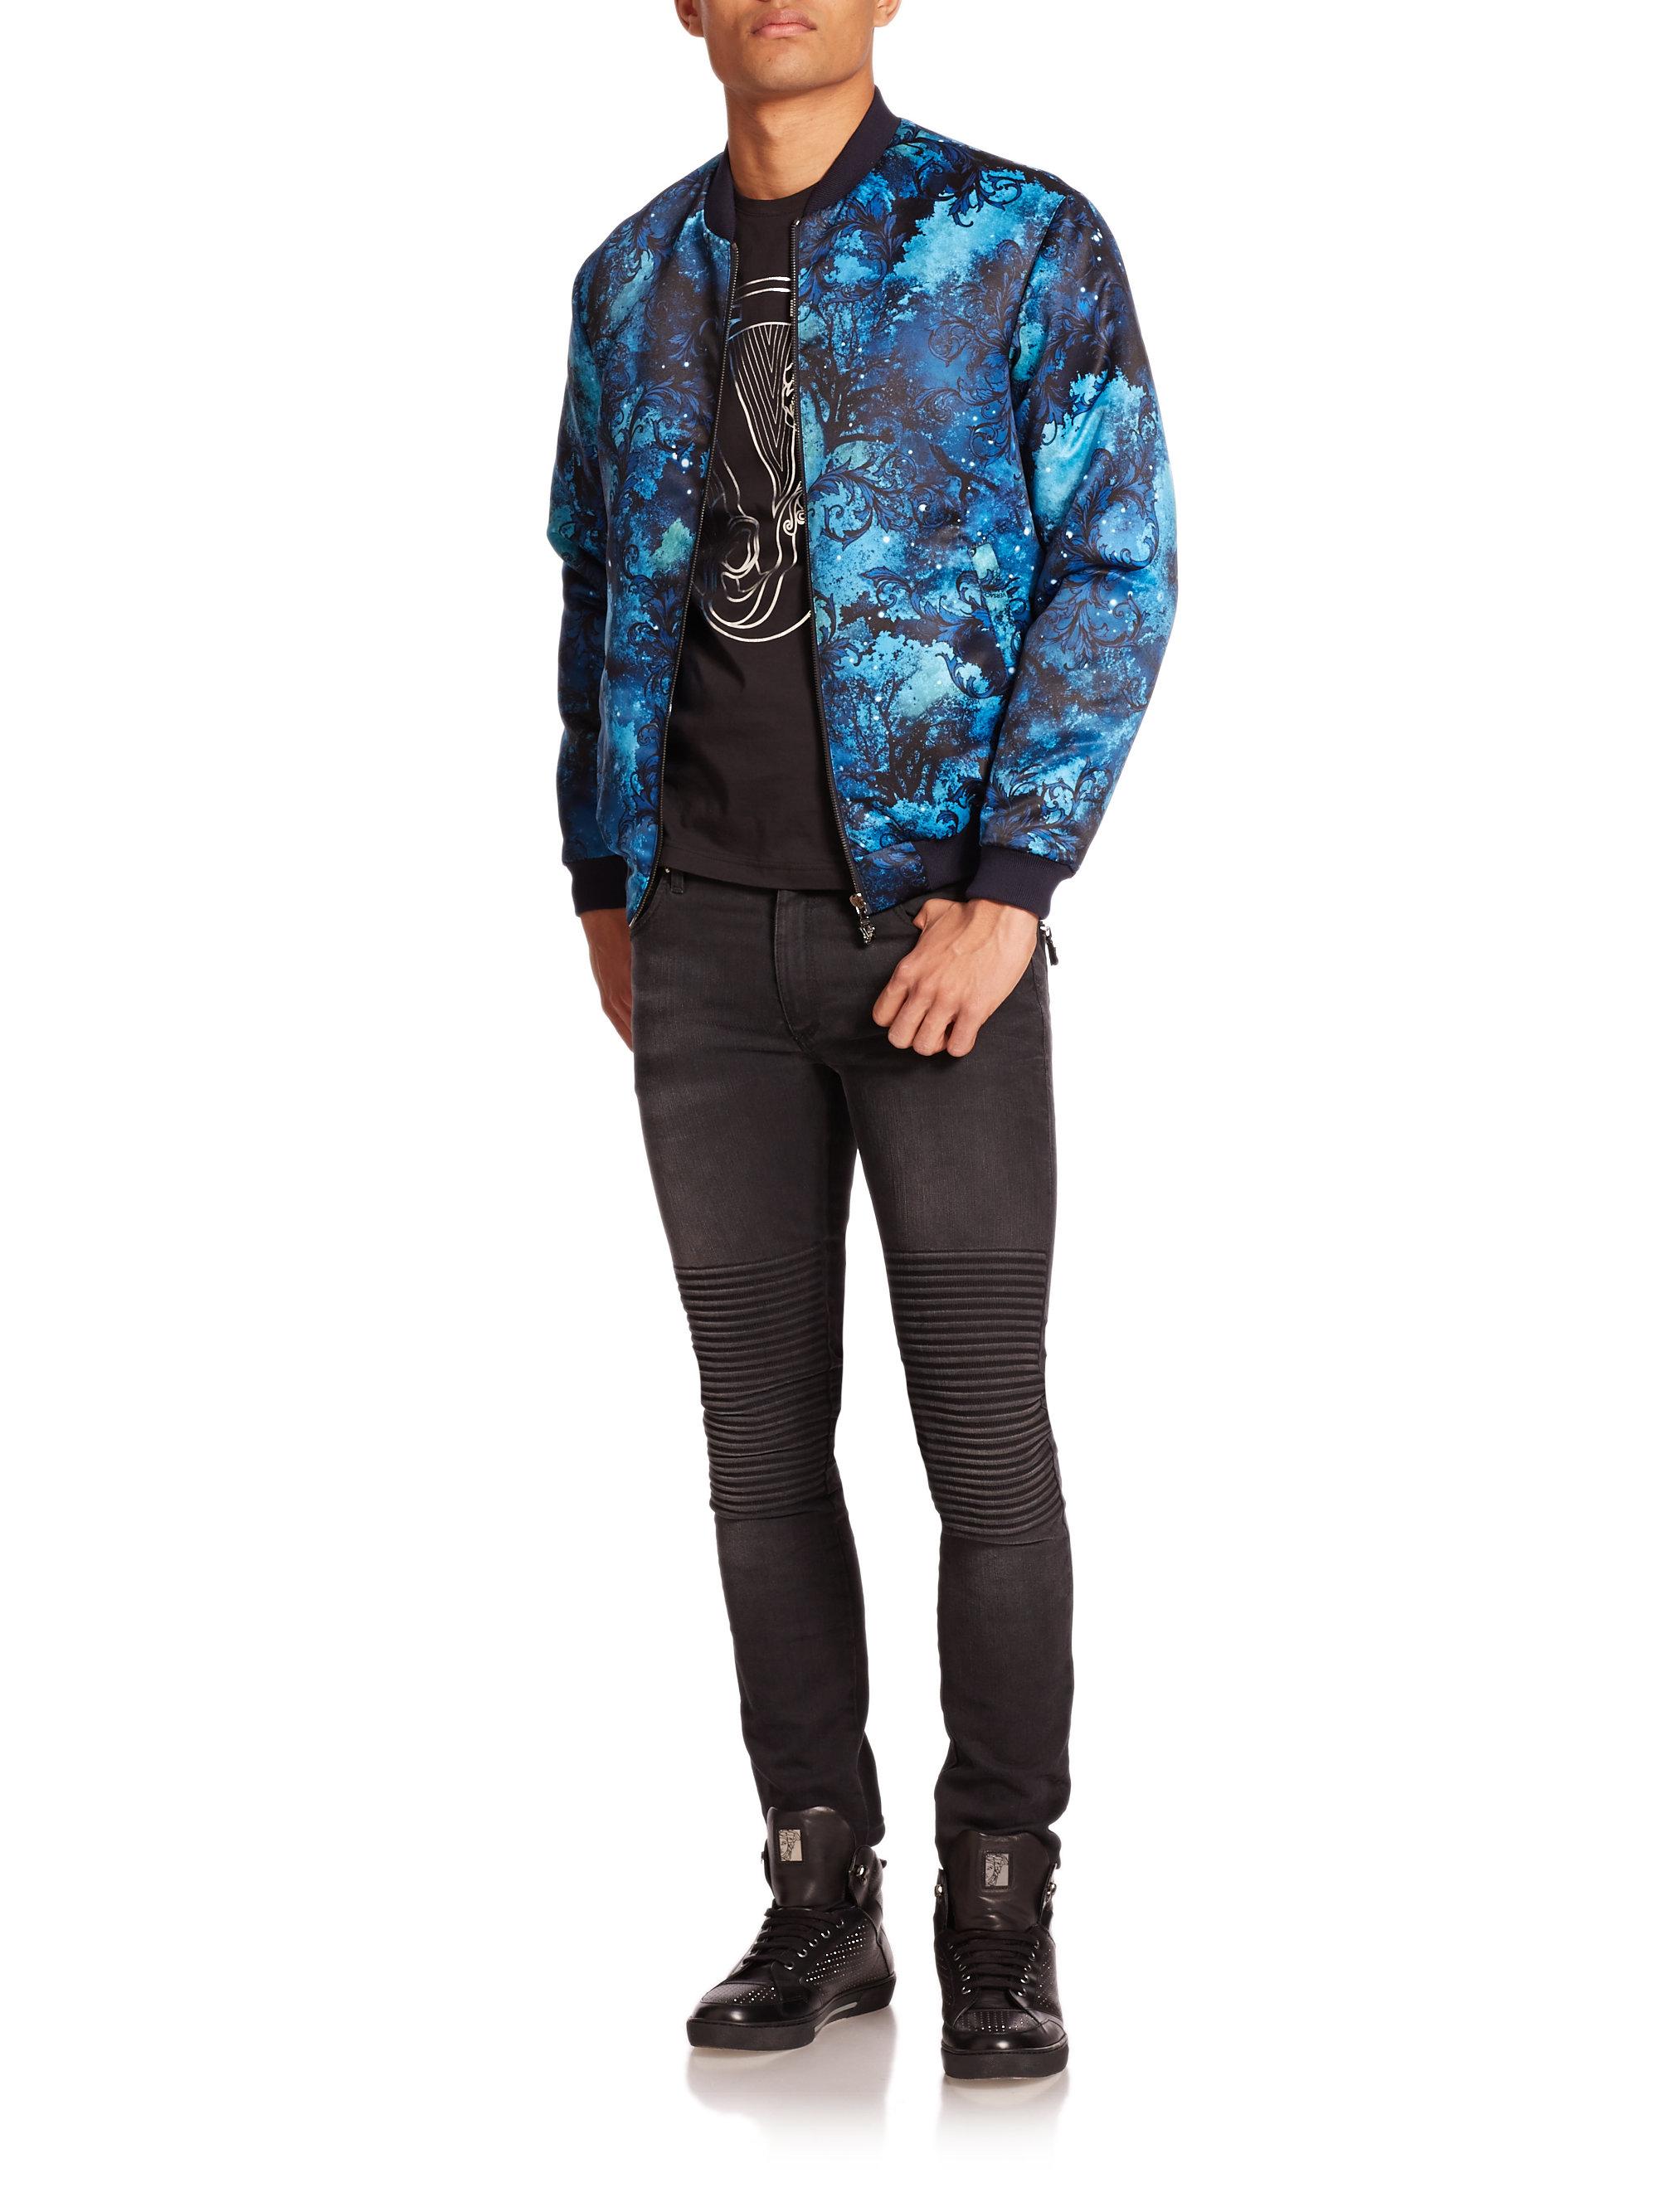 Lyst - Versace Jeans Celestial-print Jacket in Blue for Men